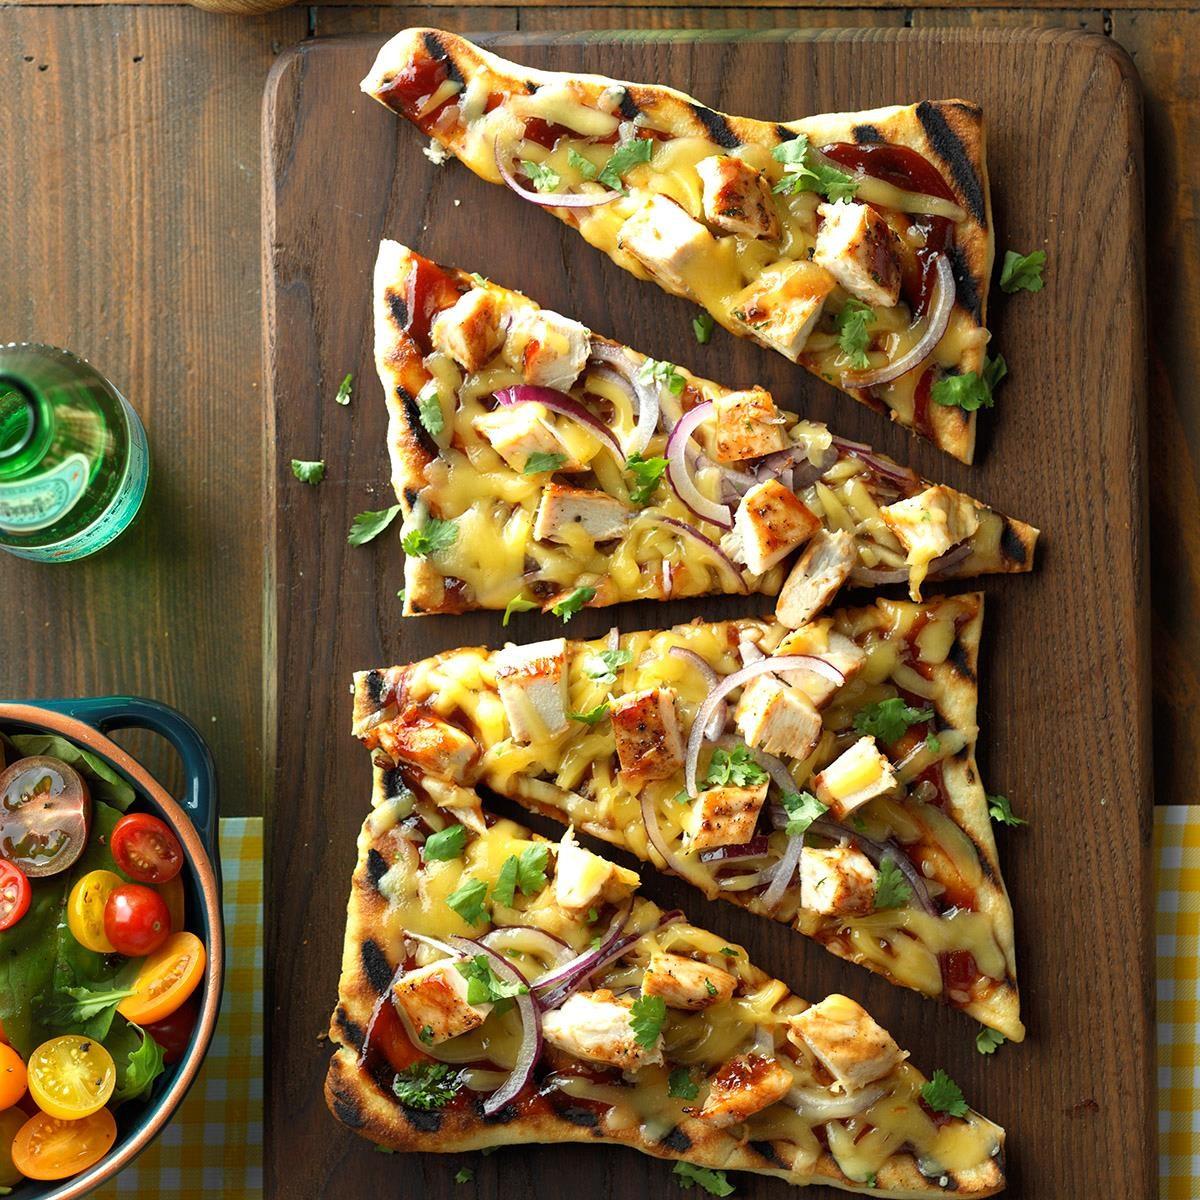 Peachy 29 California Pizza Kitchen Copycat Recipes To Make At Home Download Free Architecture Designs Rallybritishbridgeorg